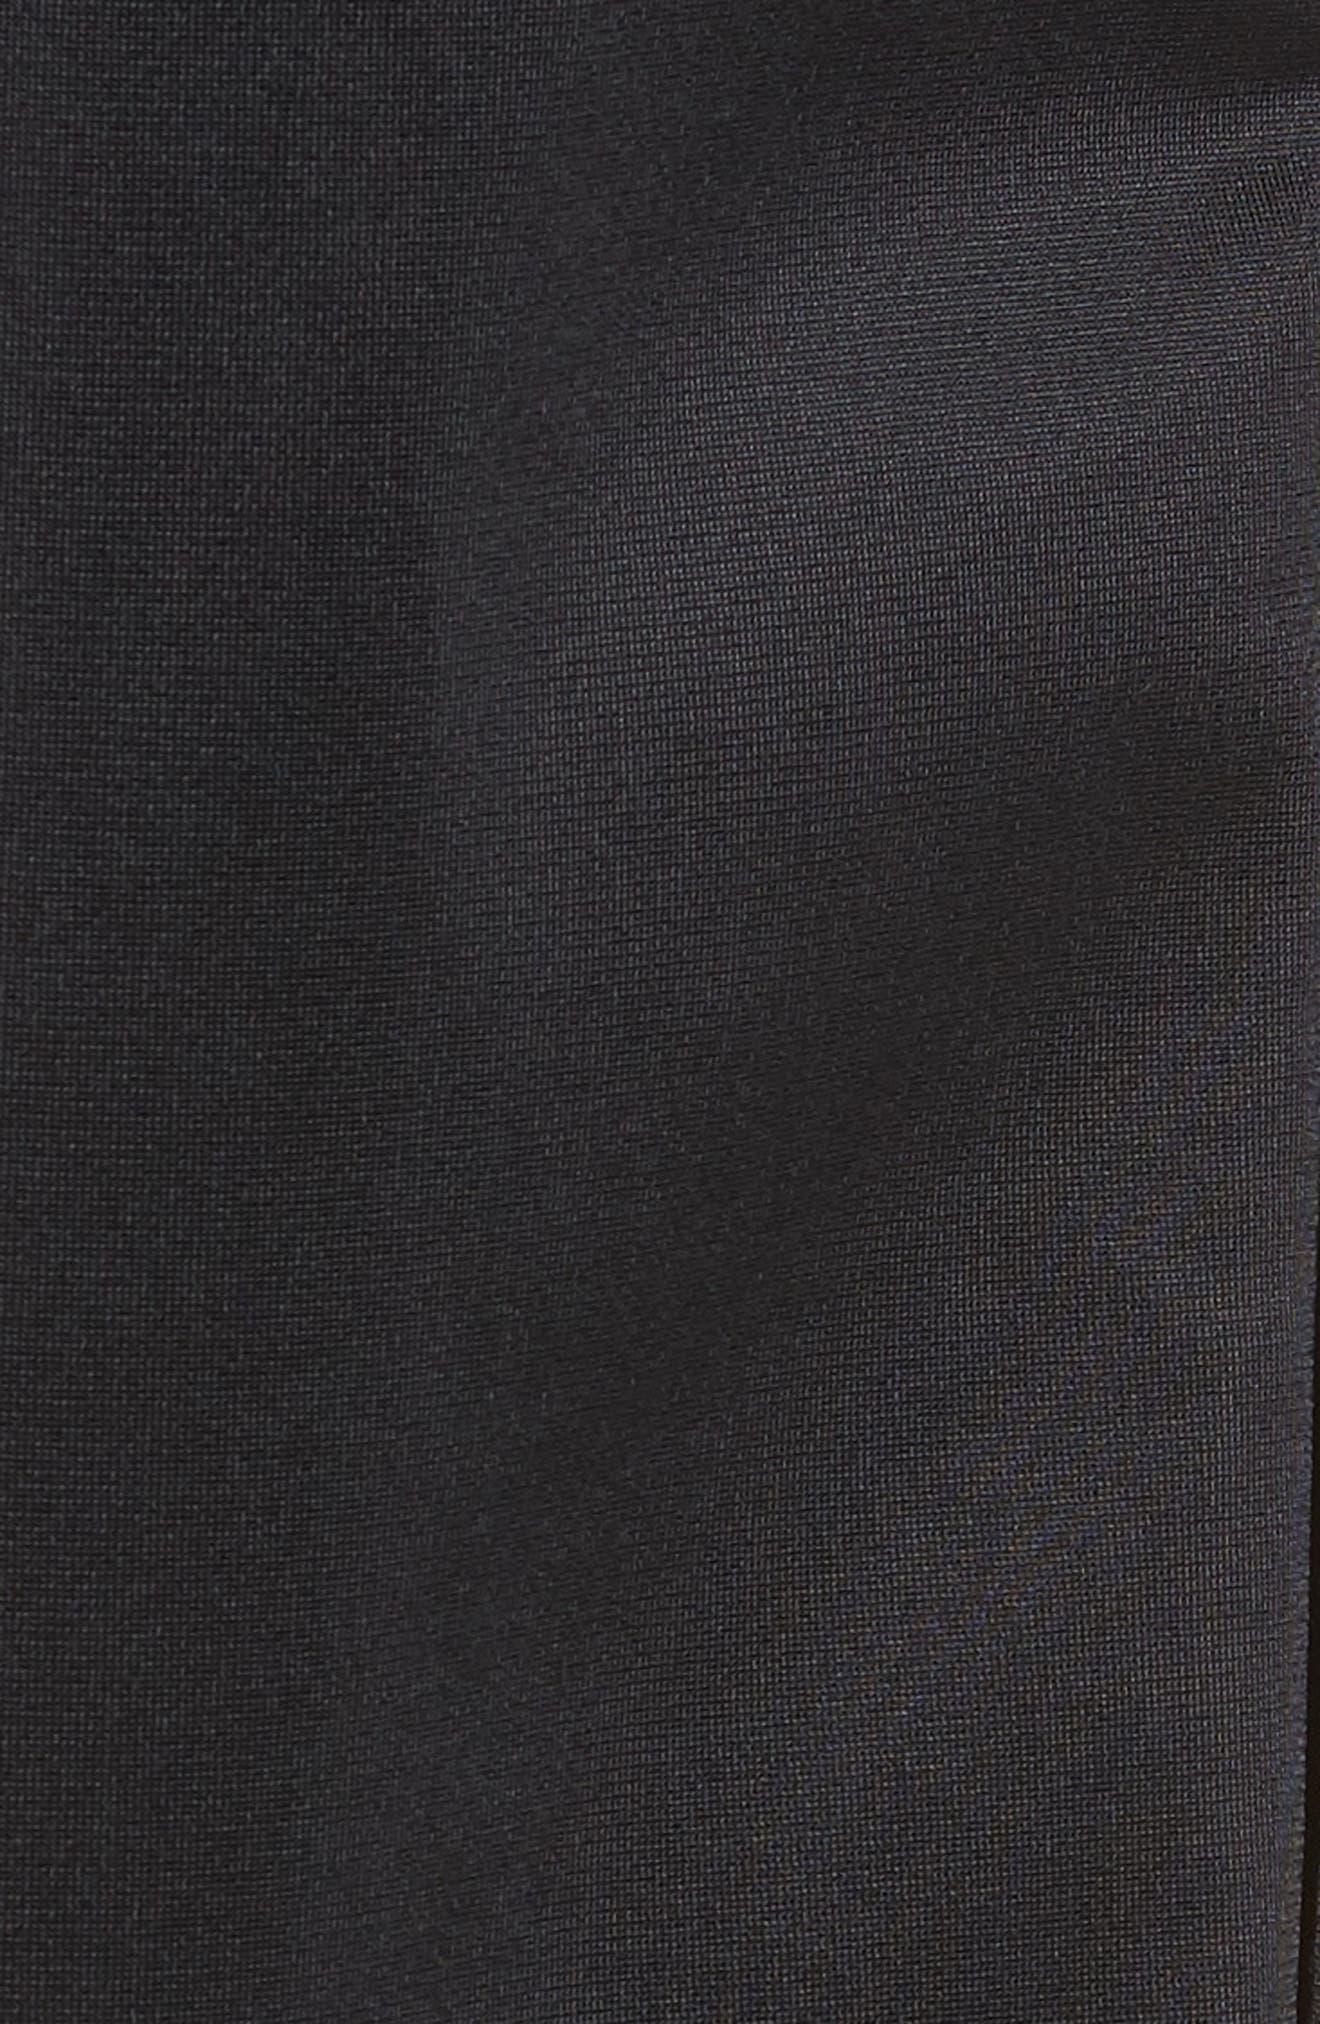 Polywarp Knit Pants,                             Alternate thumbnail 5, color,                             001